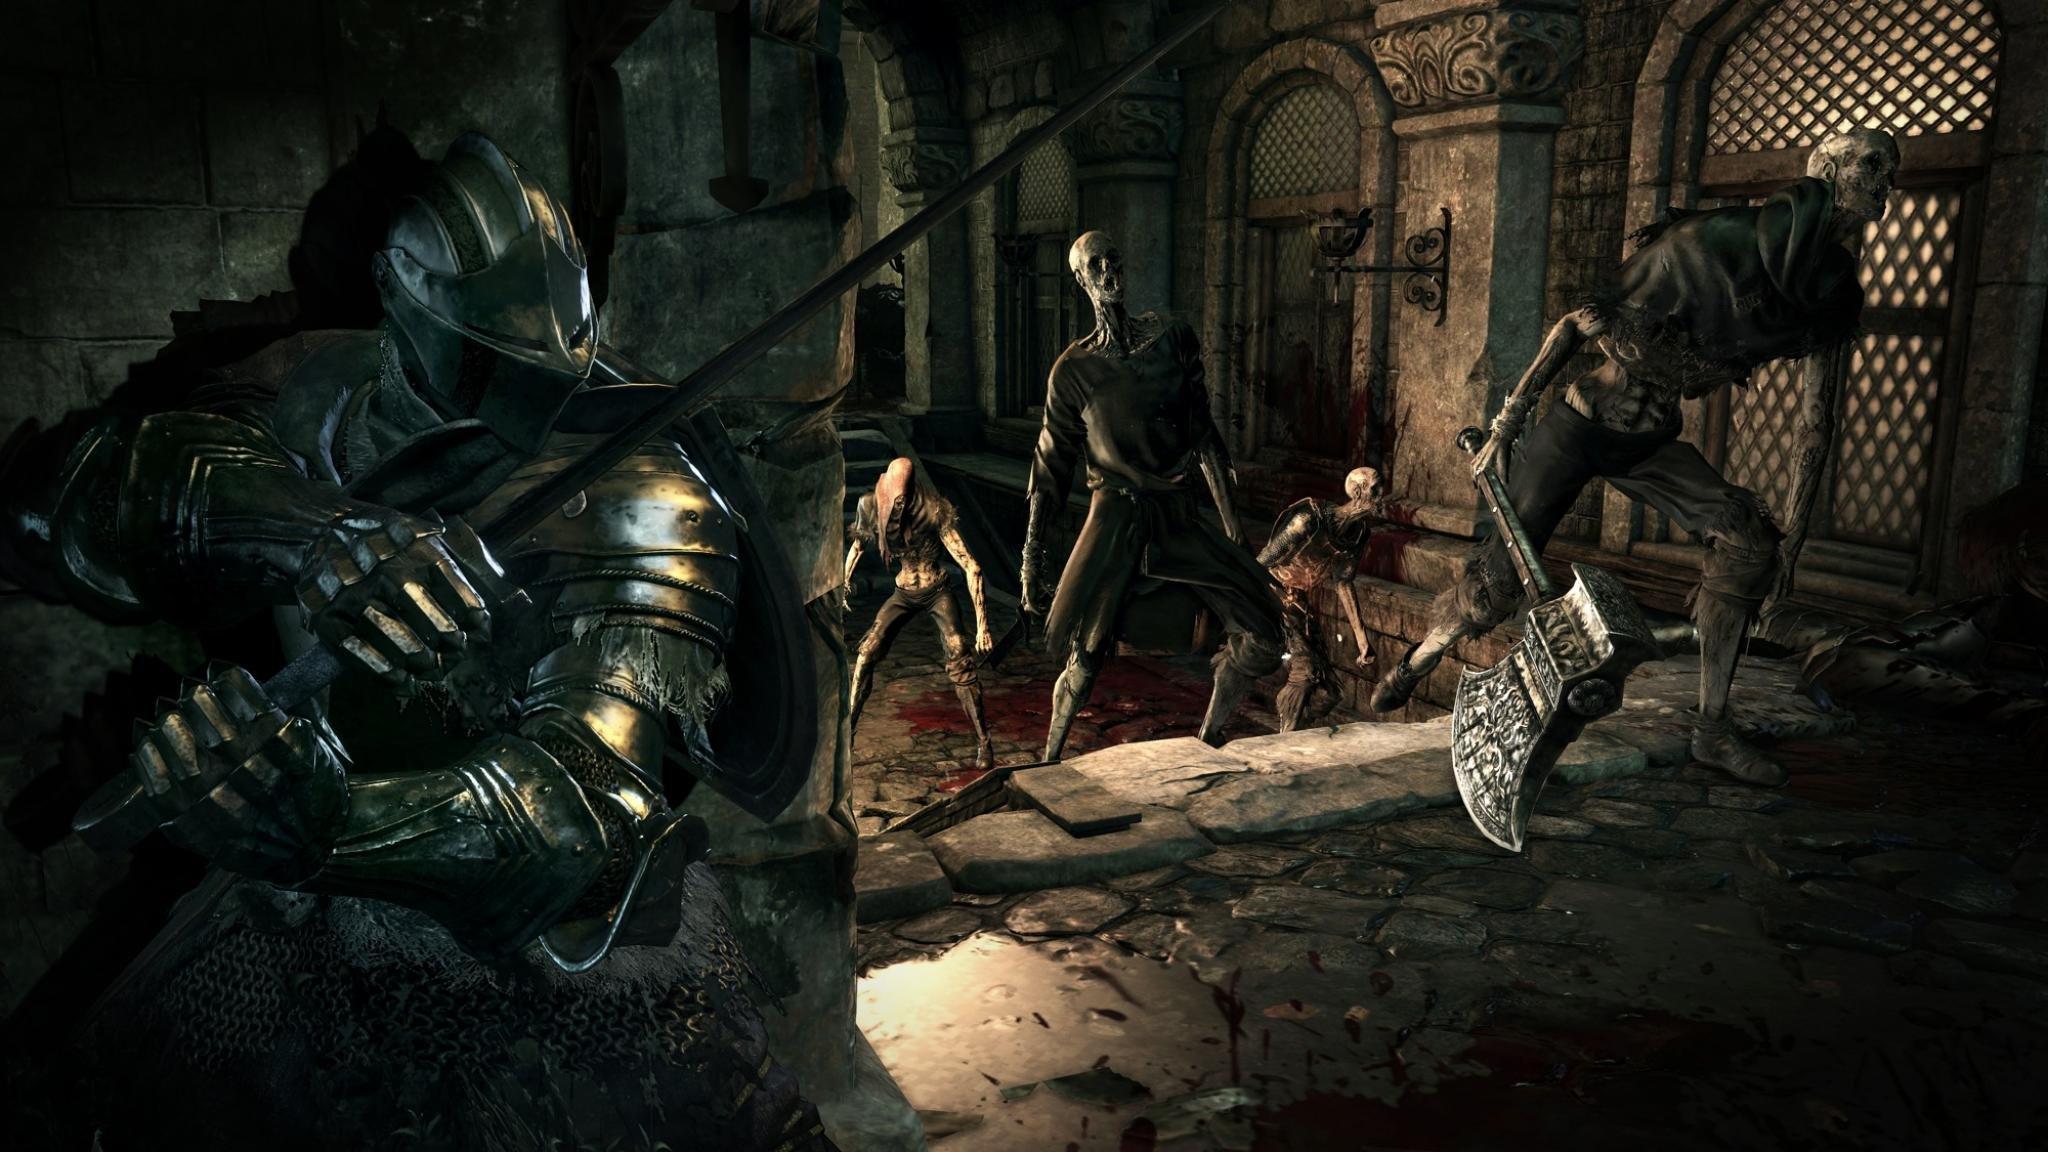 Dark Souls 3 Wallpapers Hd For Desktop Backgrounds